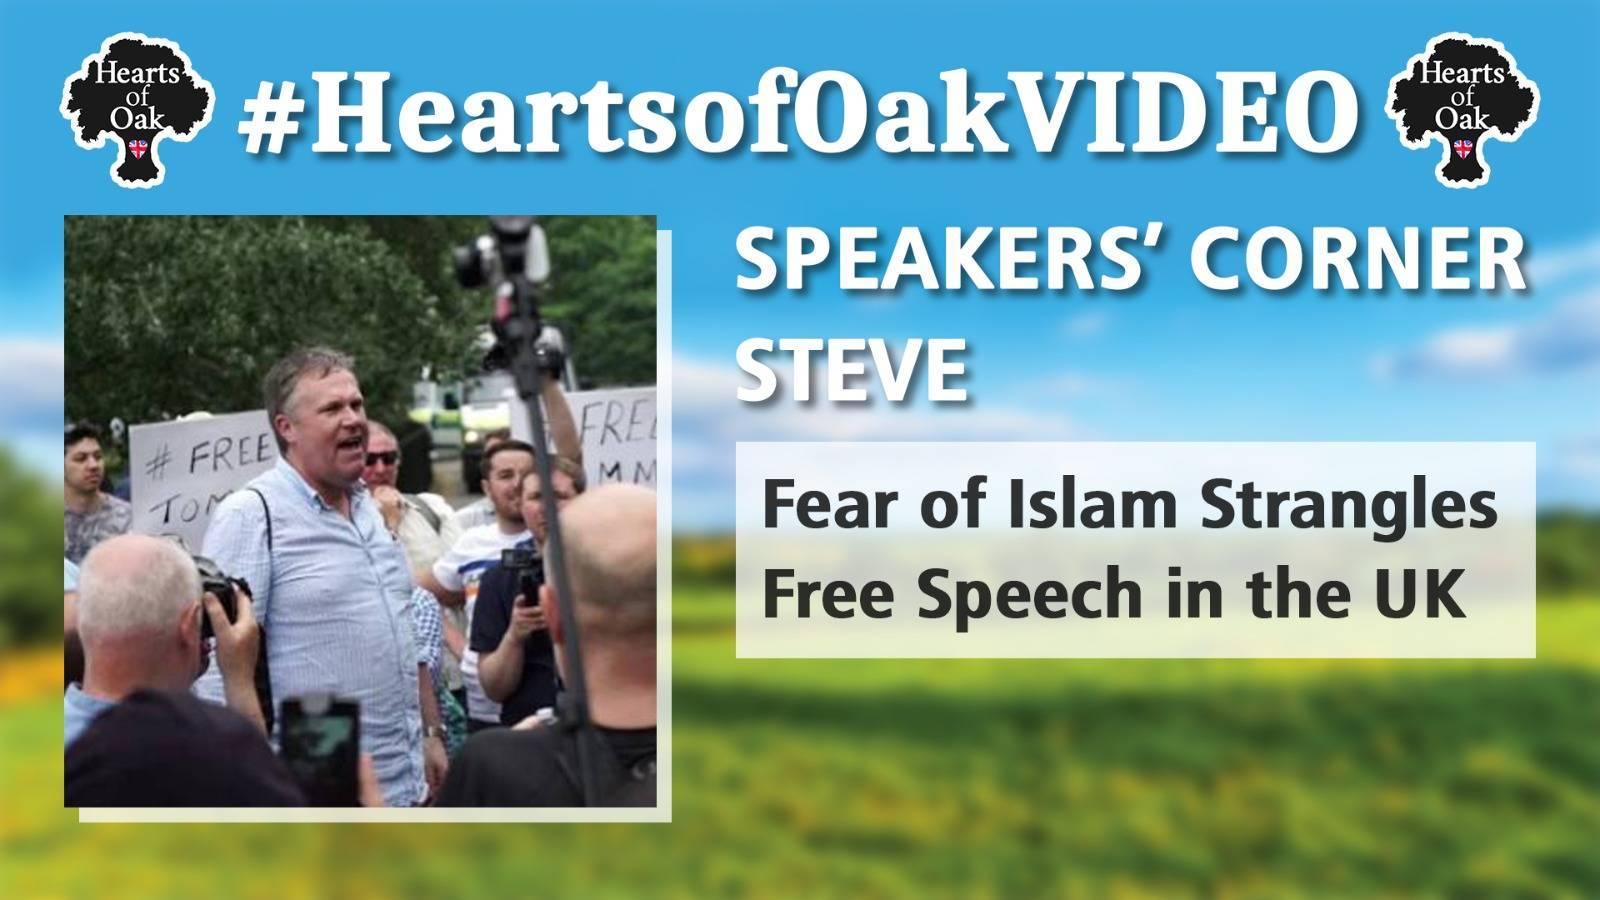 Speakers Corner Steve: Fear of Islam Strangles Free Speech in the UK